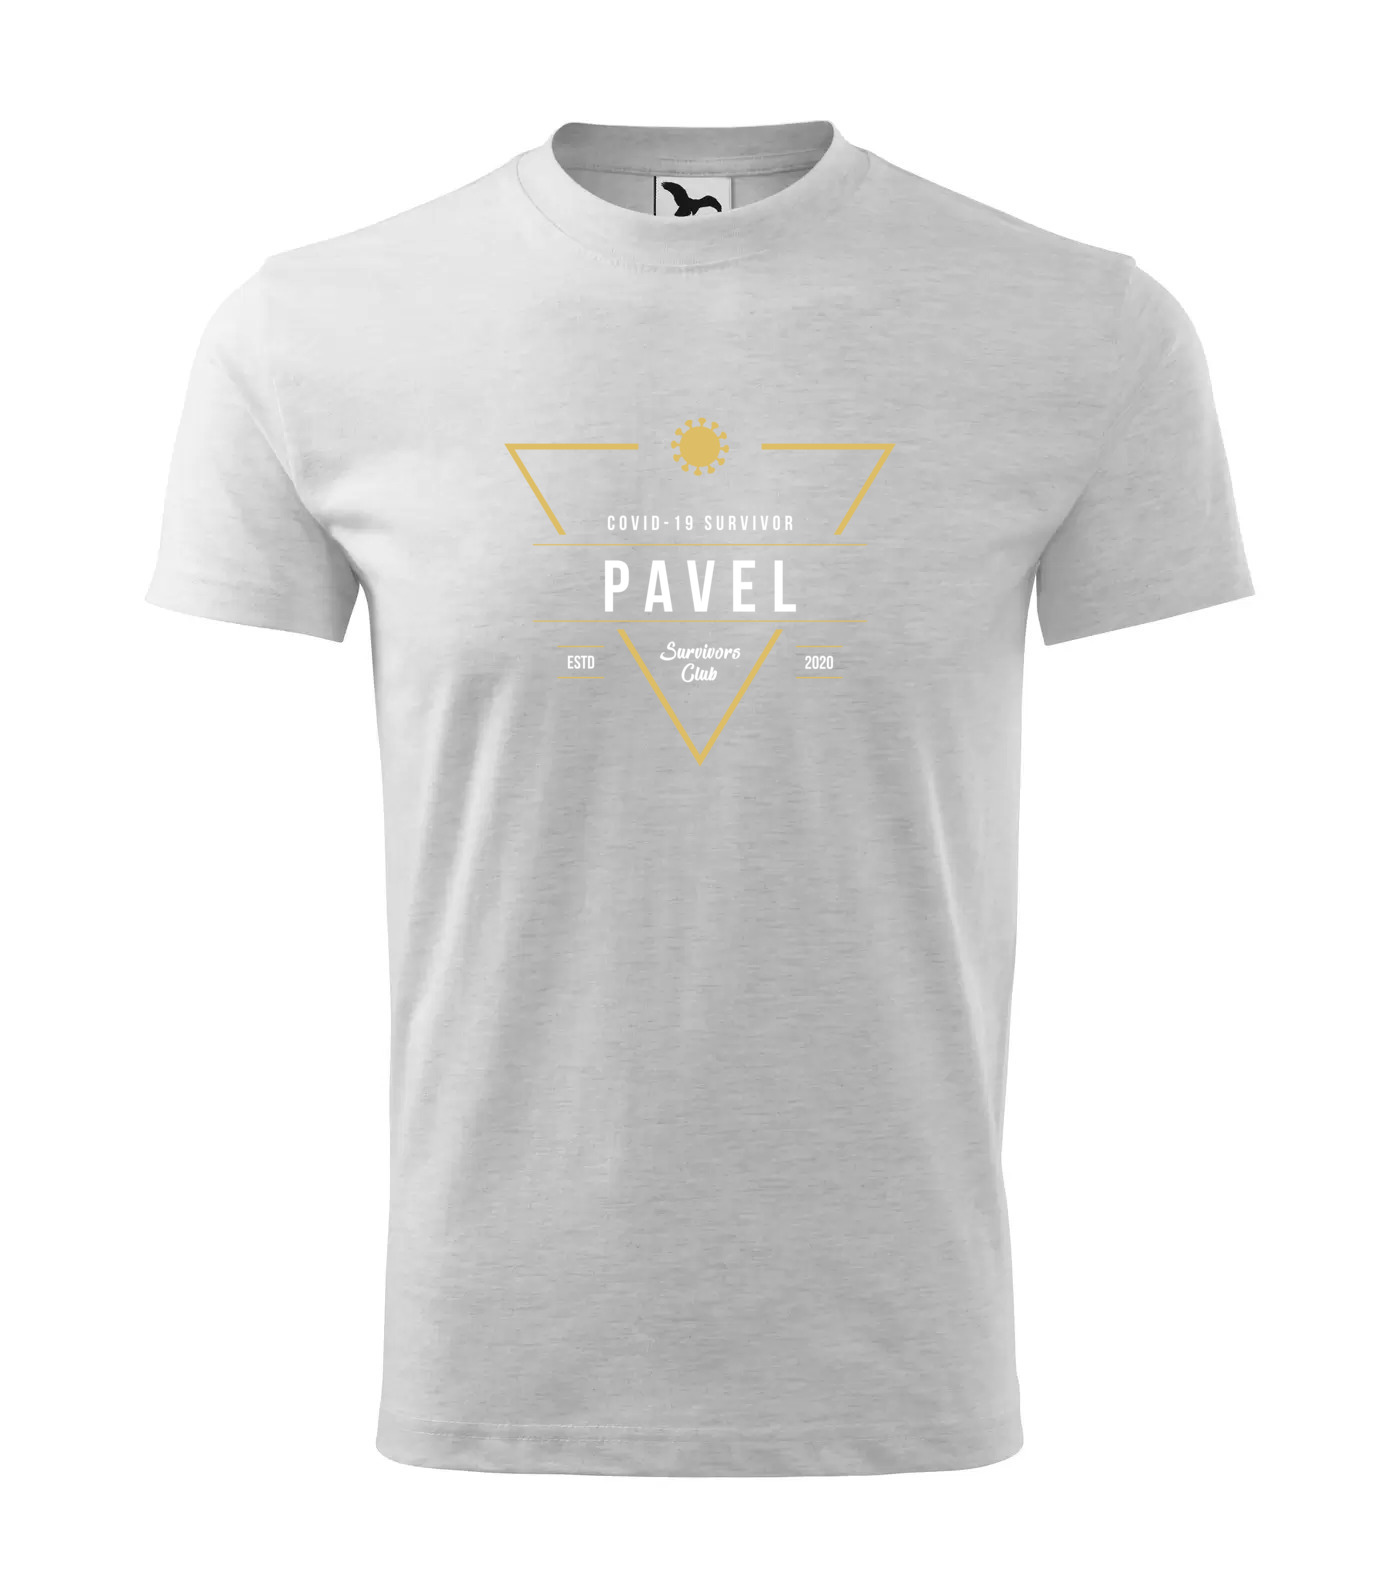 Tričko Survivor Club Pavel